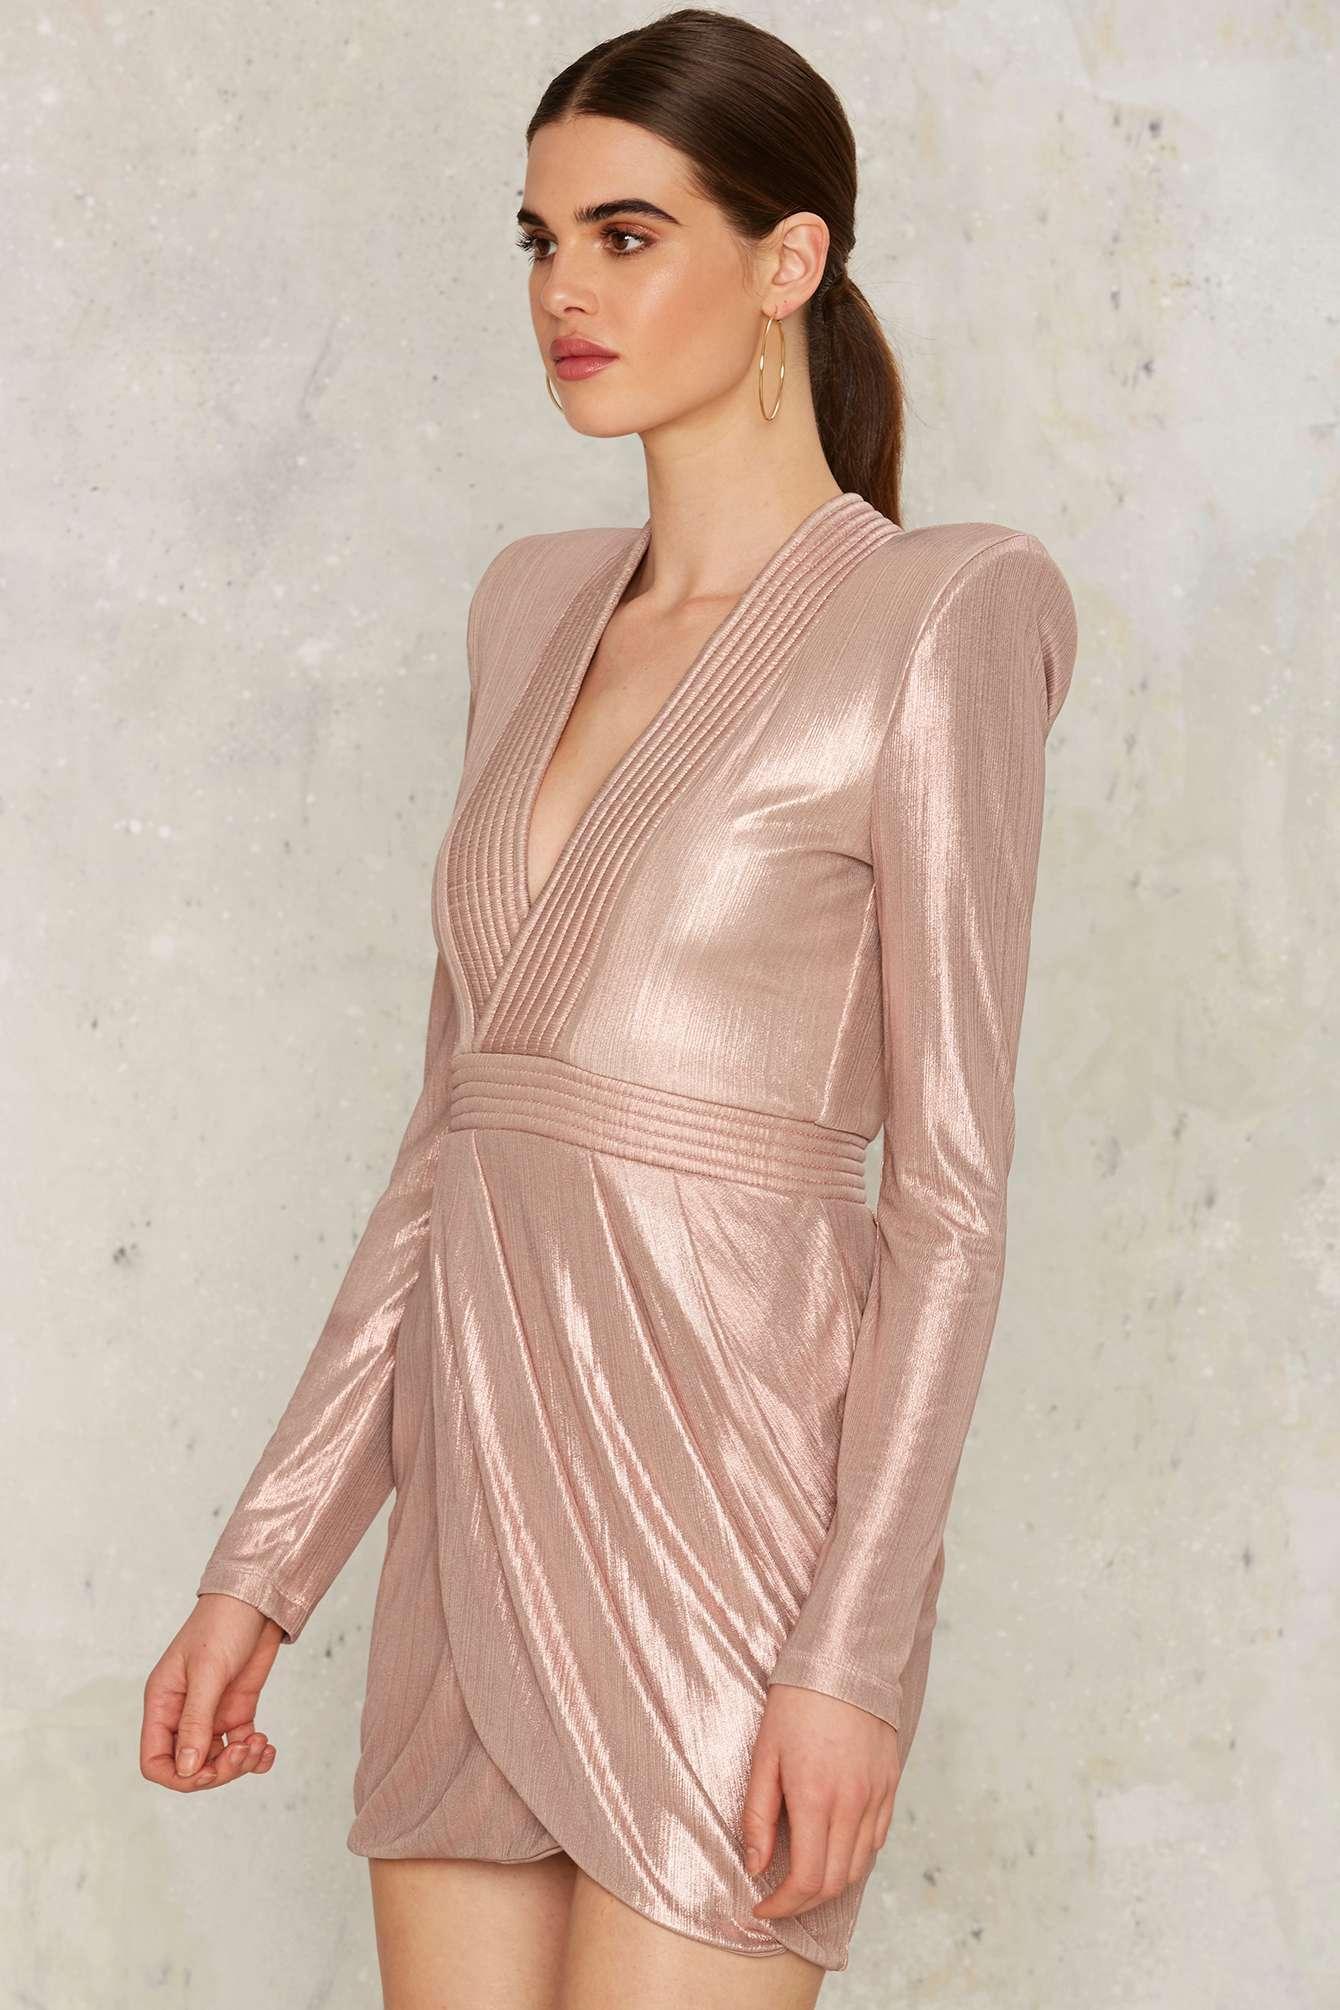 d1ab1cde0529 Zhivago Eye Of Horus Mini Dress - Metallic in Pink - Lyst